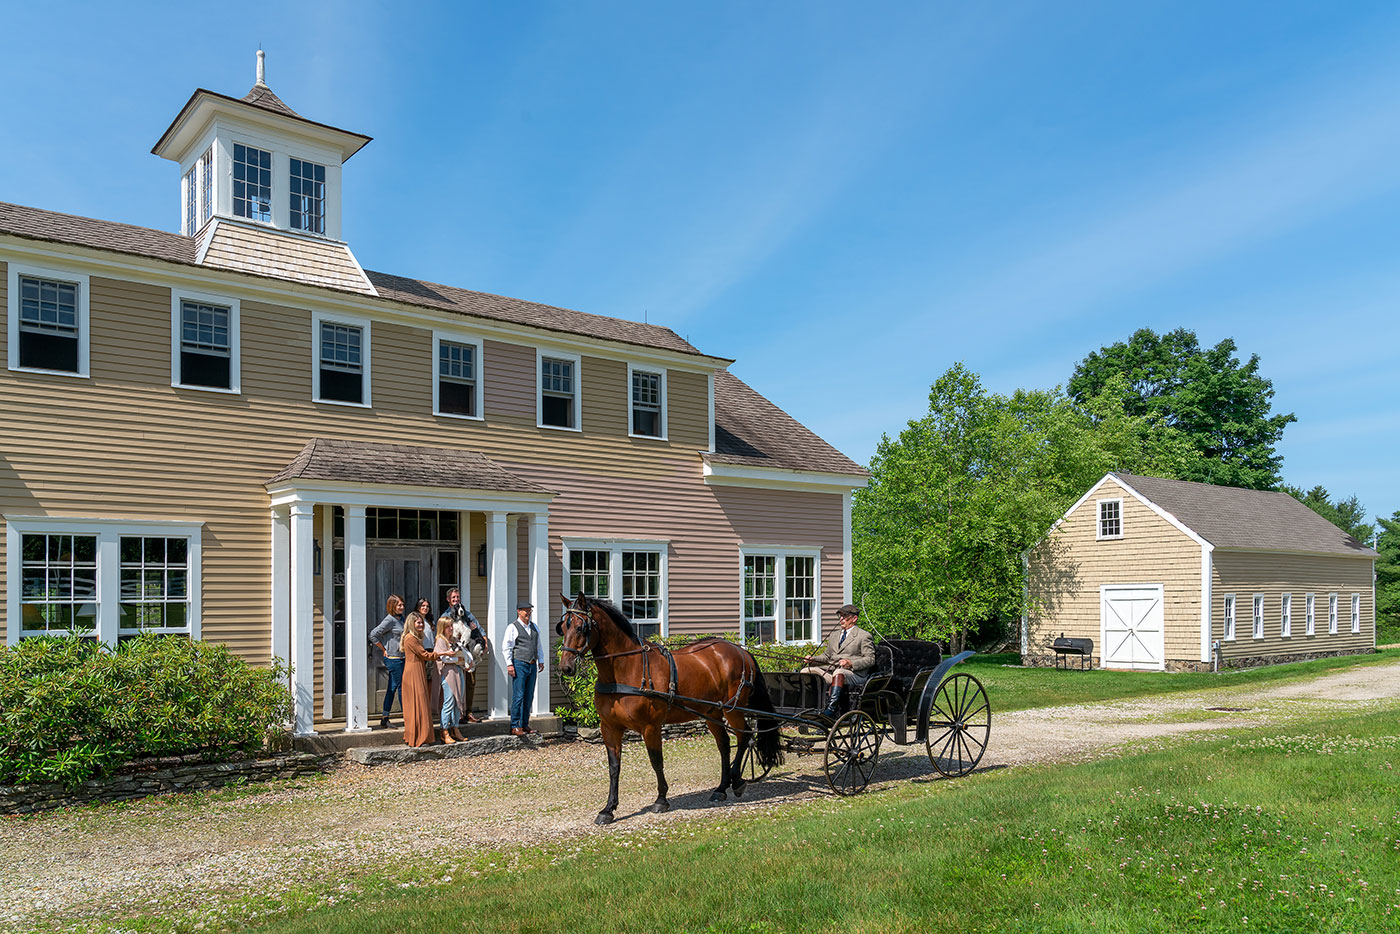 Interior Designer Michael Carter's New Hampshire getaway